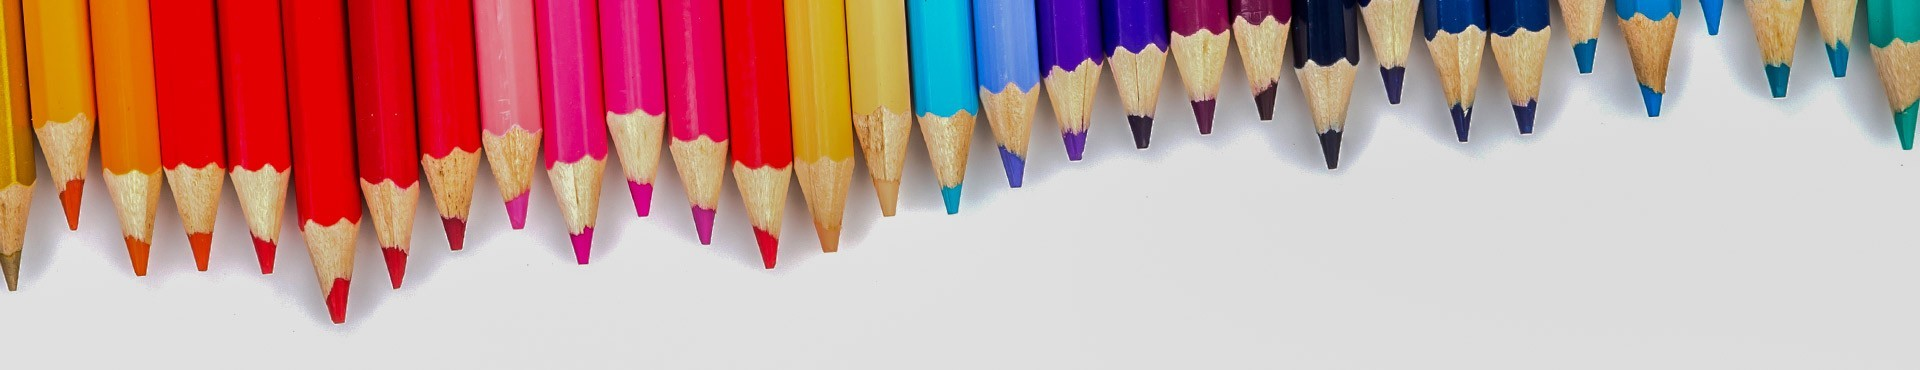 Lápices de Colores Acuarelables